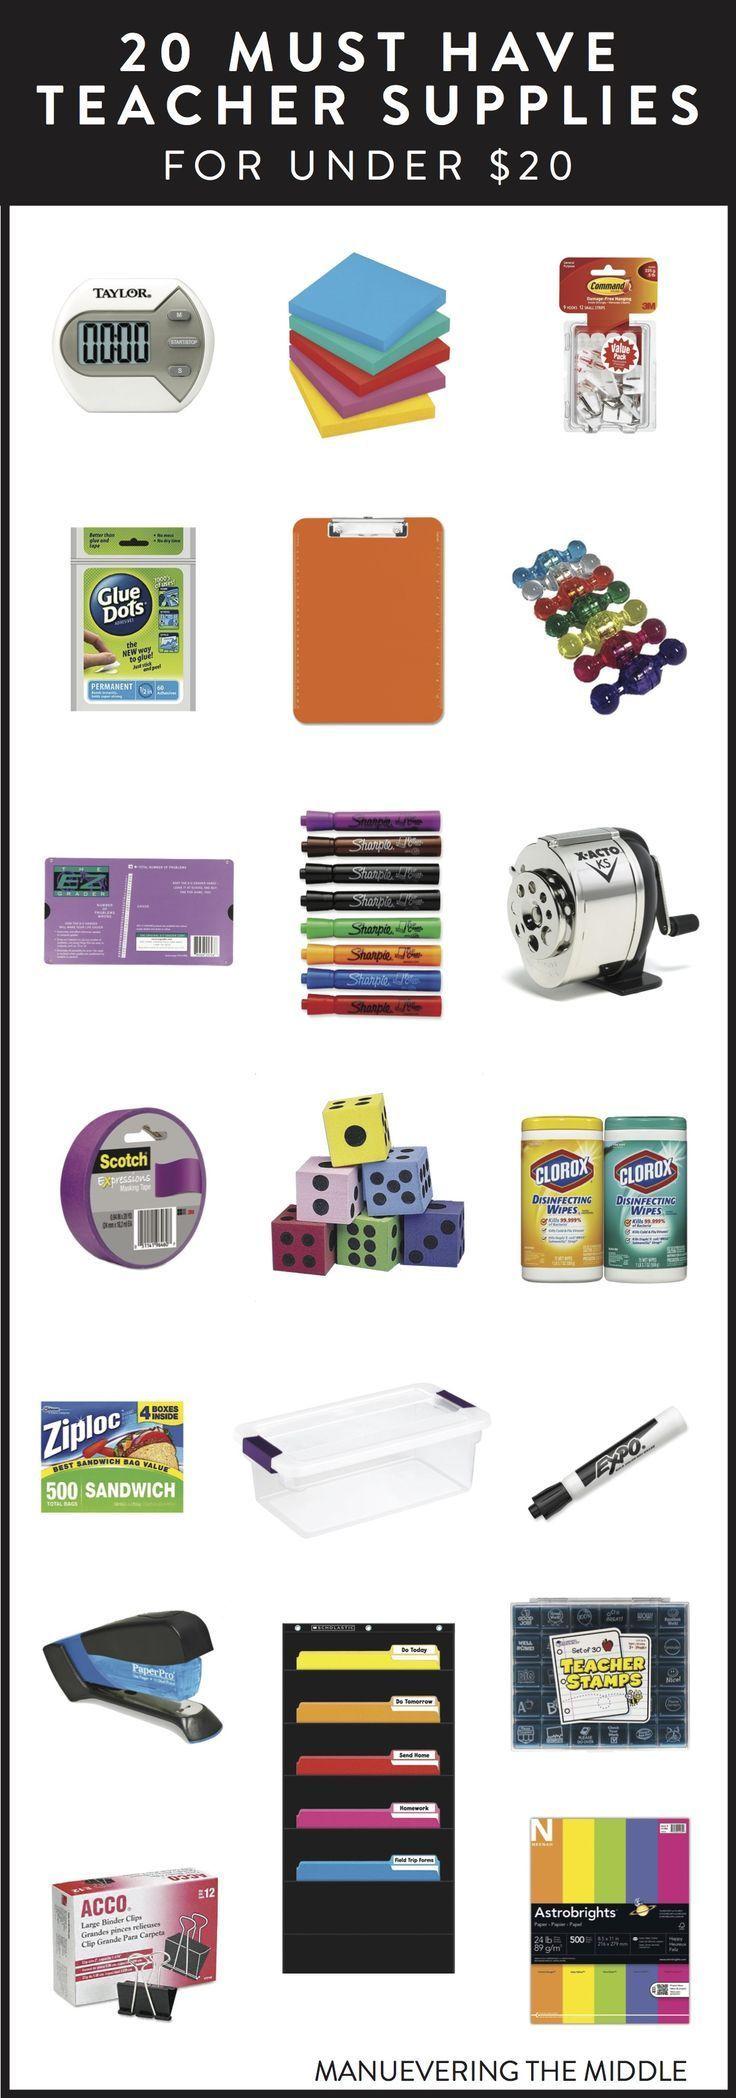 20 Teacher Supplies Under $20 - Must have school supplies to stock your classroom. | http://maneuveringthemiddle.com